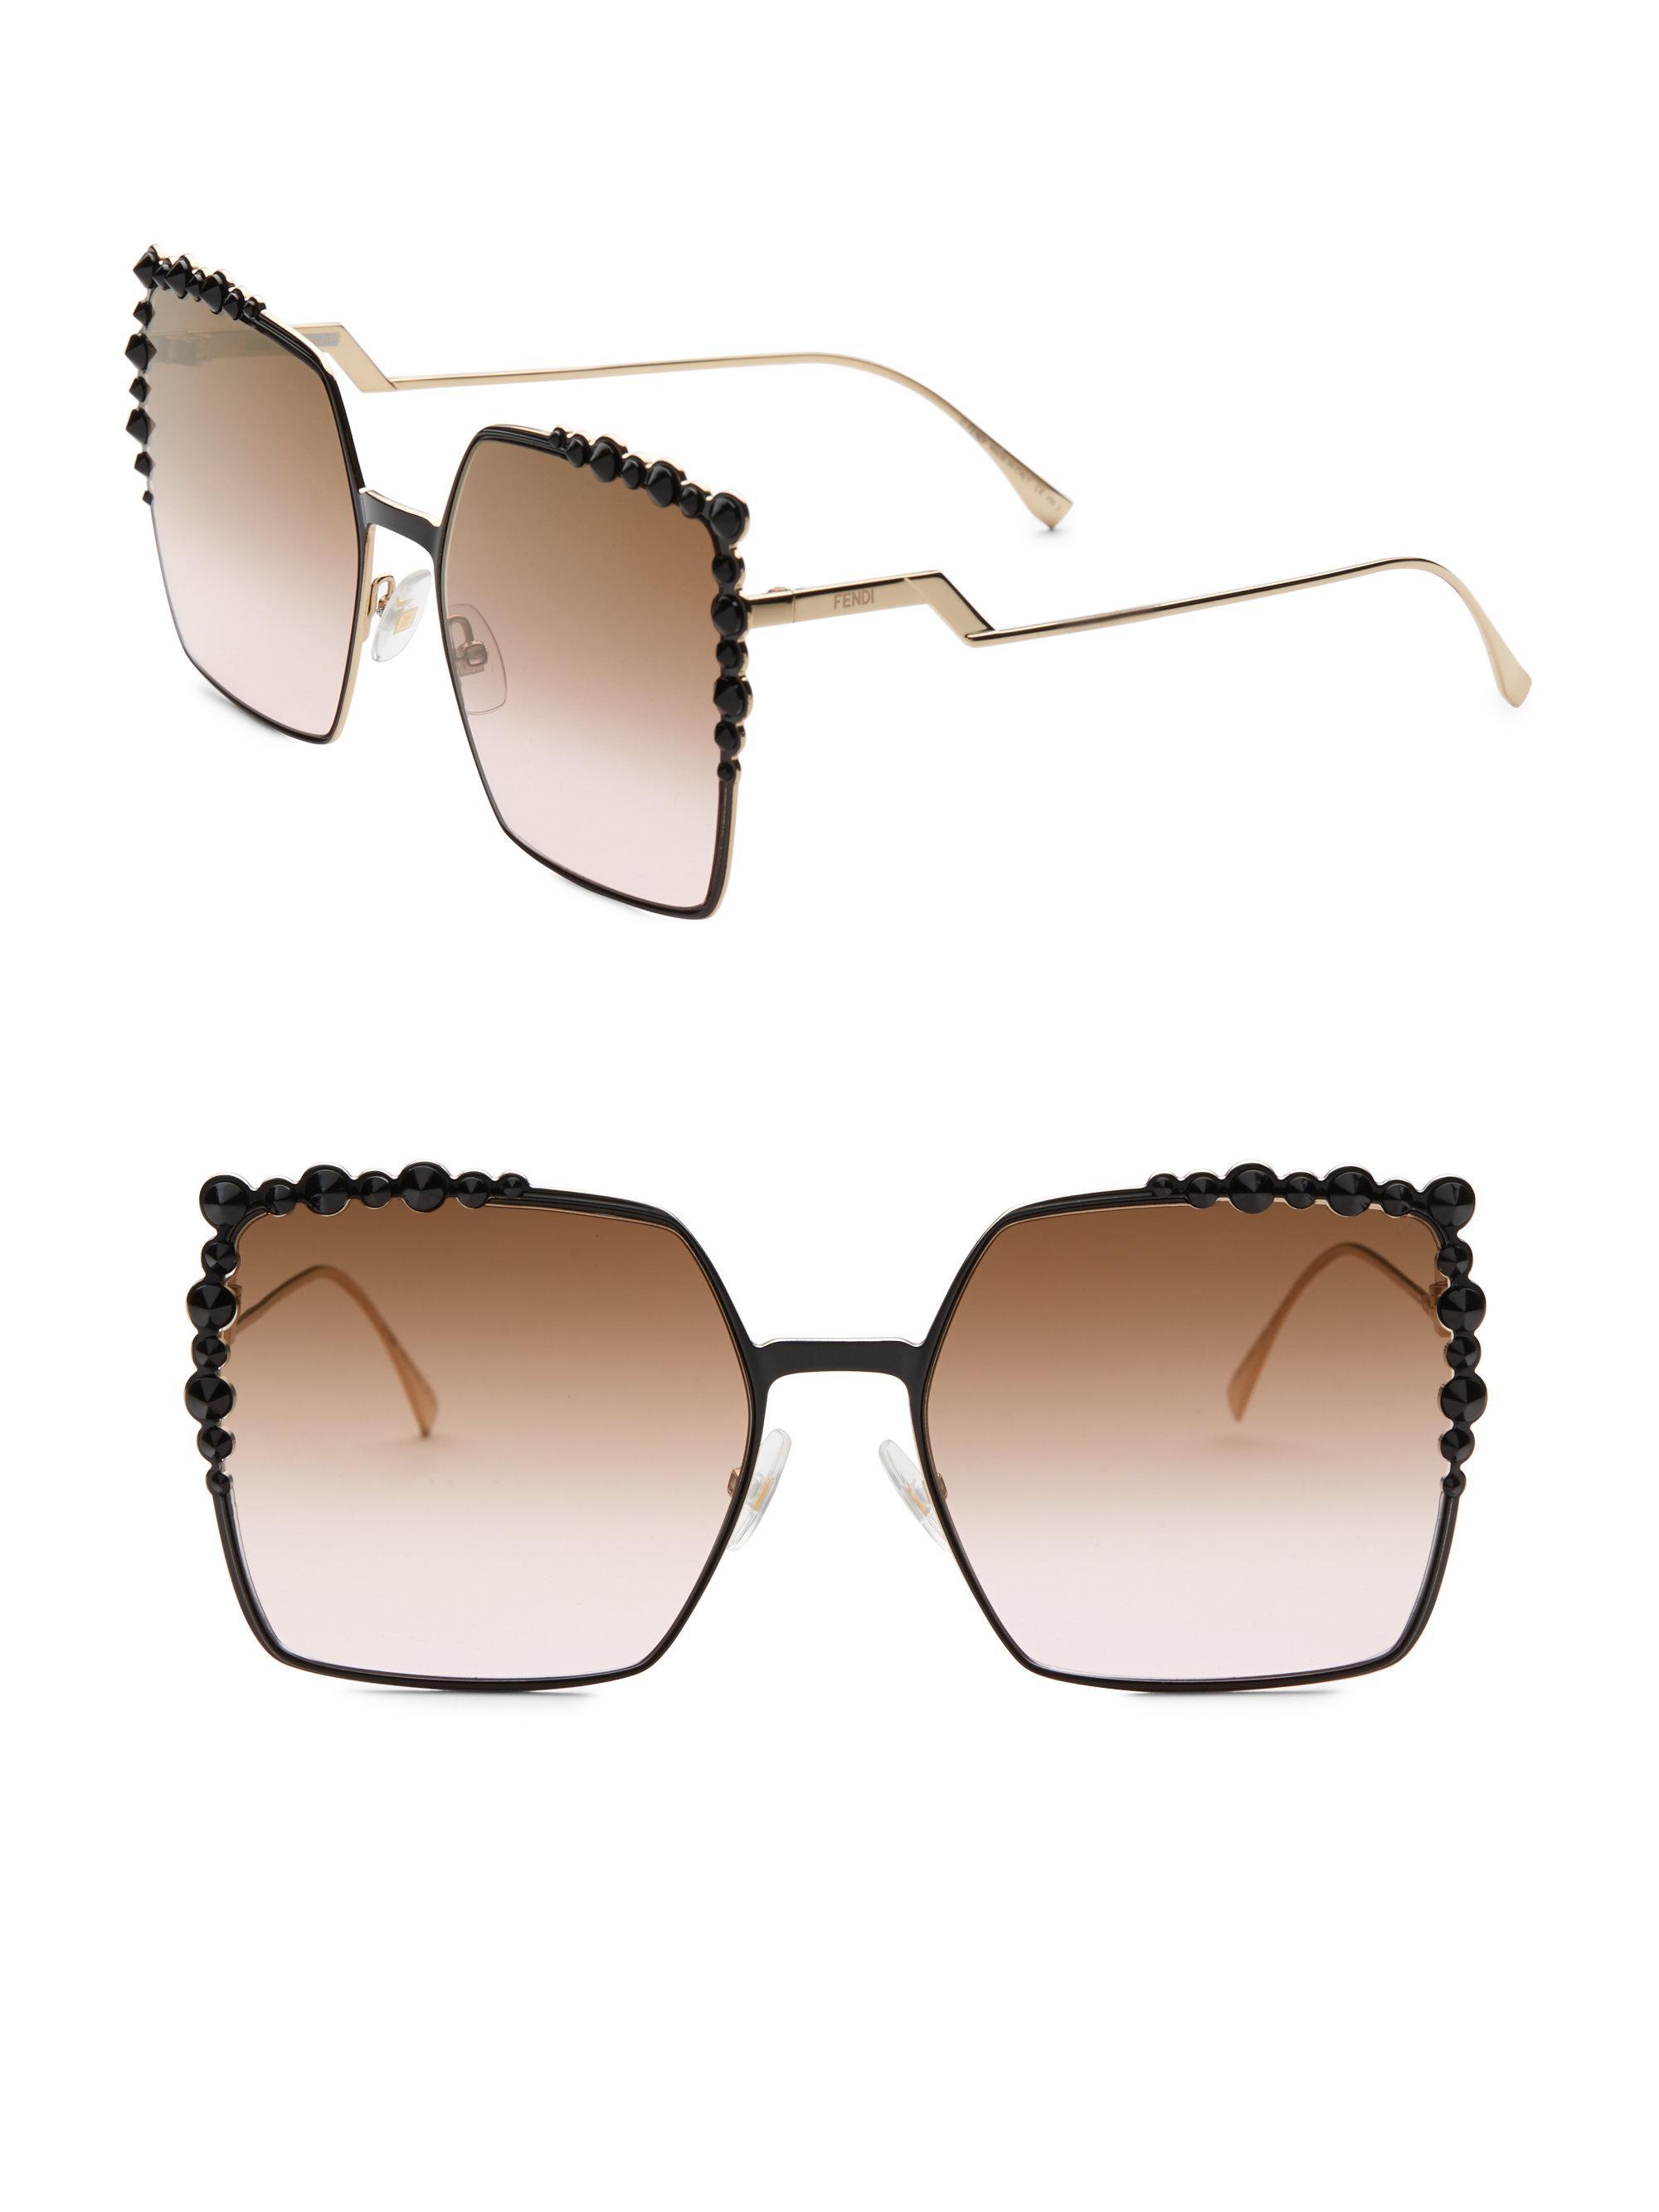 1b396788a81e Fendi 60mm Embellished Square Sunglasses in Black - Lyst